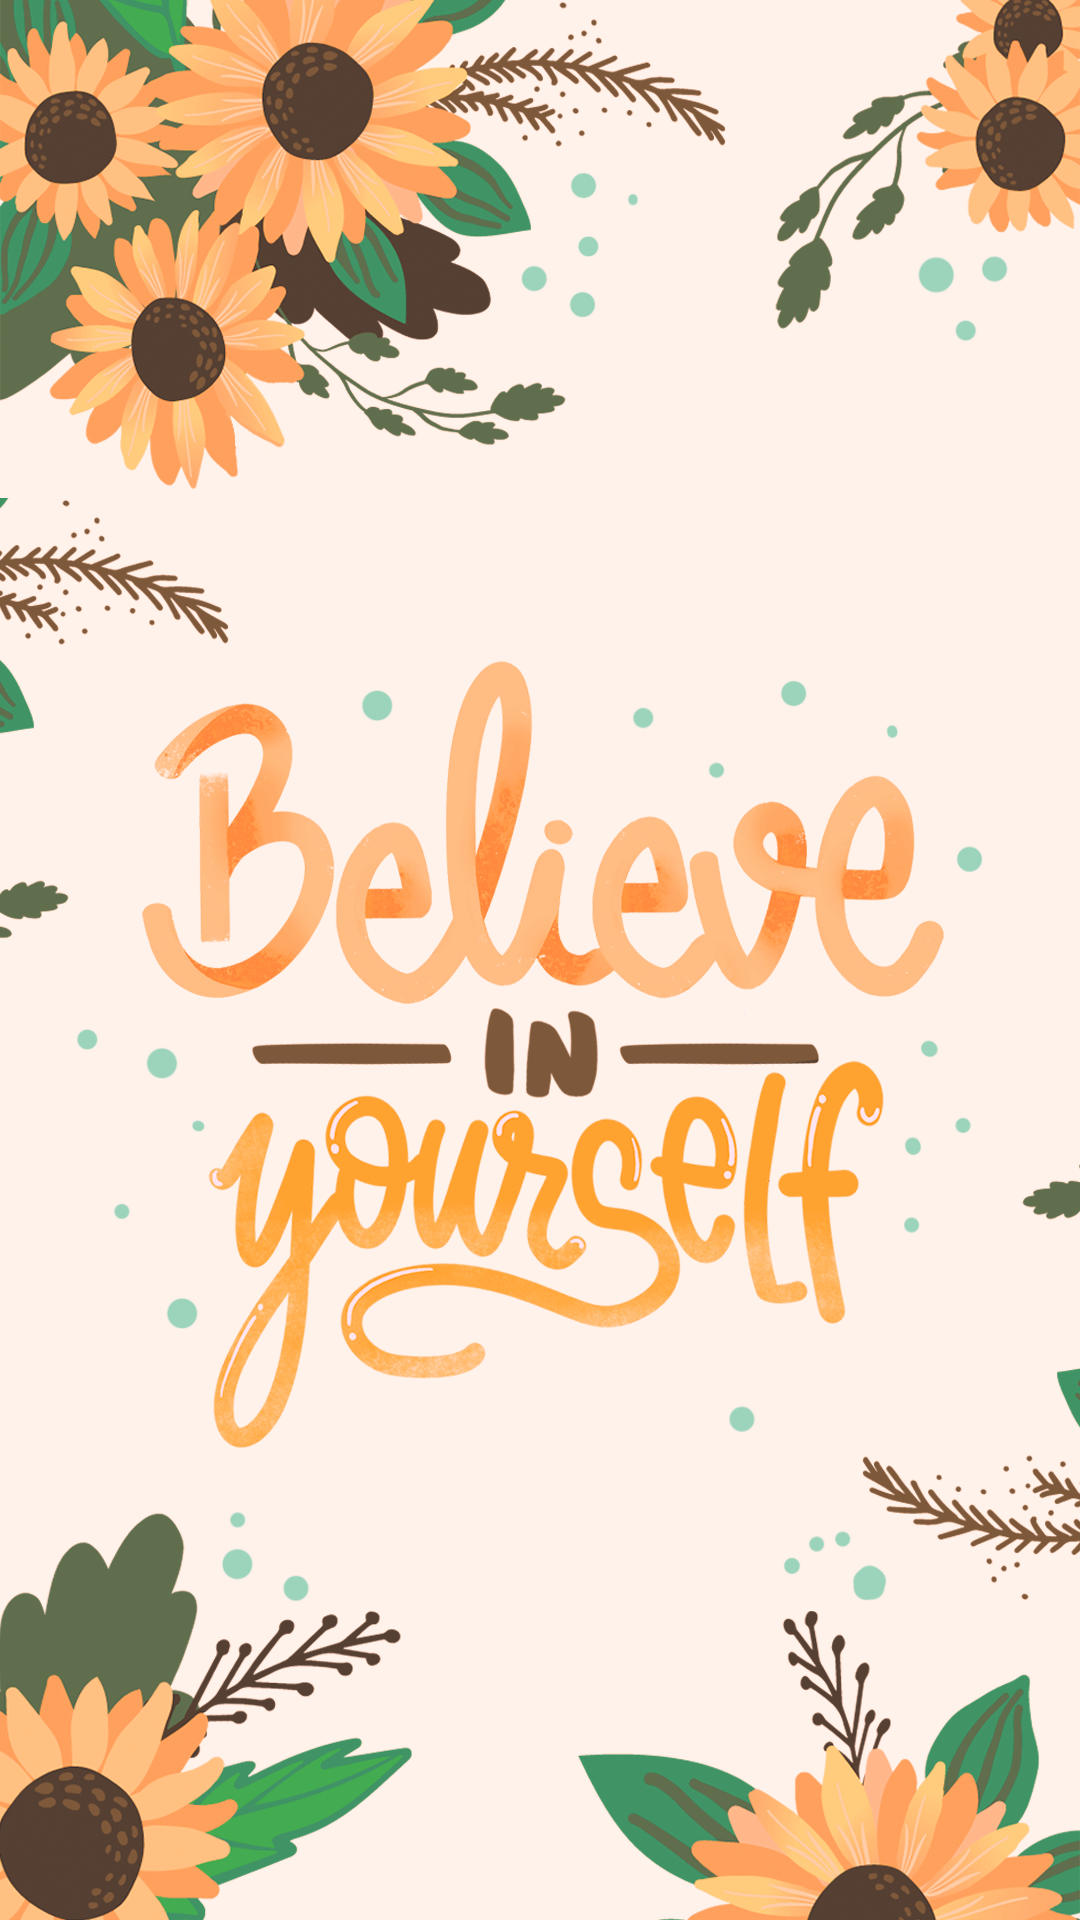 Wallpaper Believe In Yourself By Gocase Wallpaper Quotes Cute Wallpapers Positive Wallpapers